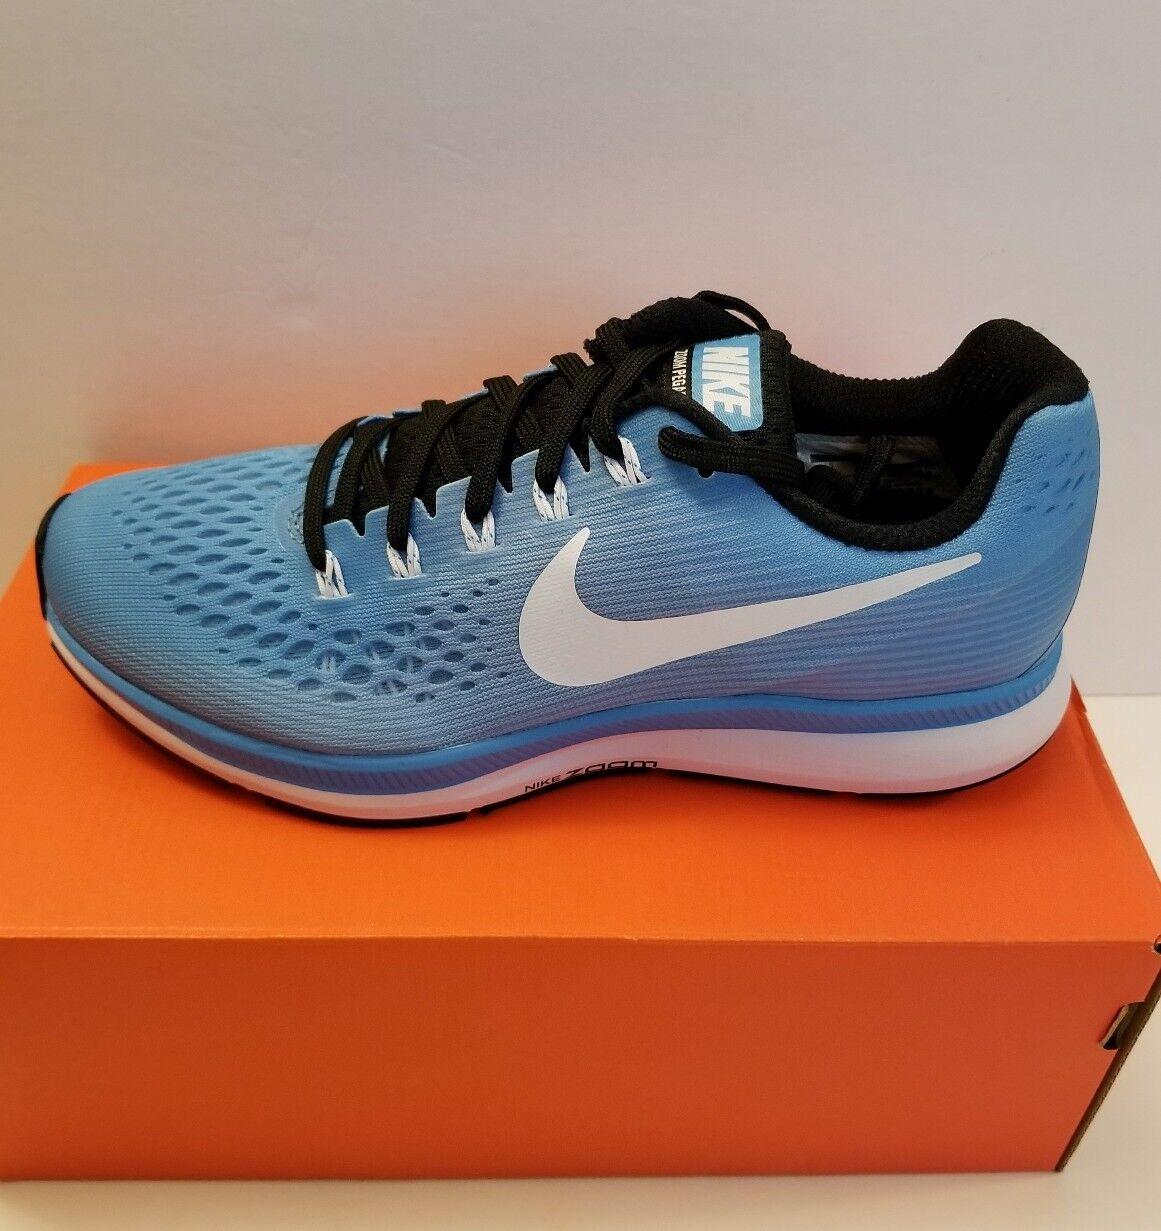 Wmns 7 Nike Air Zoom Pegasus 34 TB Sz 7 Wmns Blue/White/Black 887017-403 FREE SHIPPING 7a987a